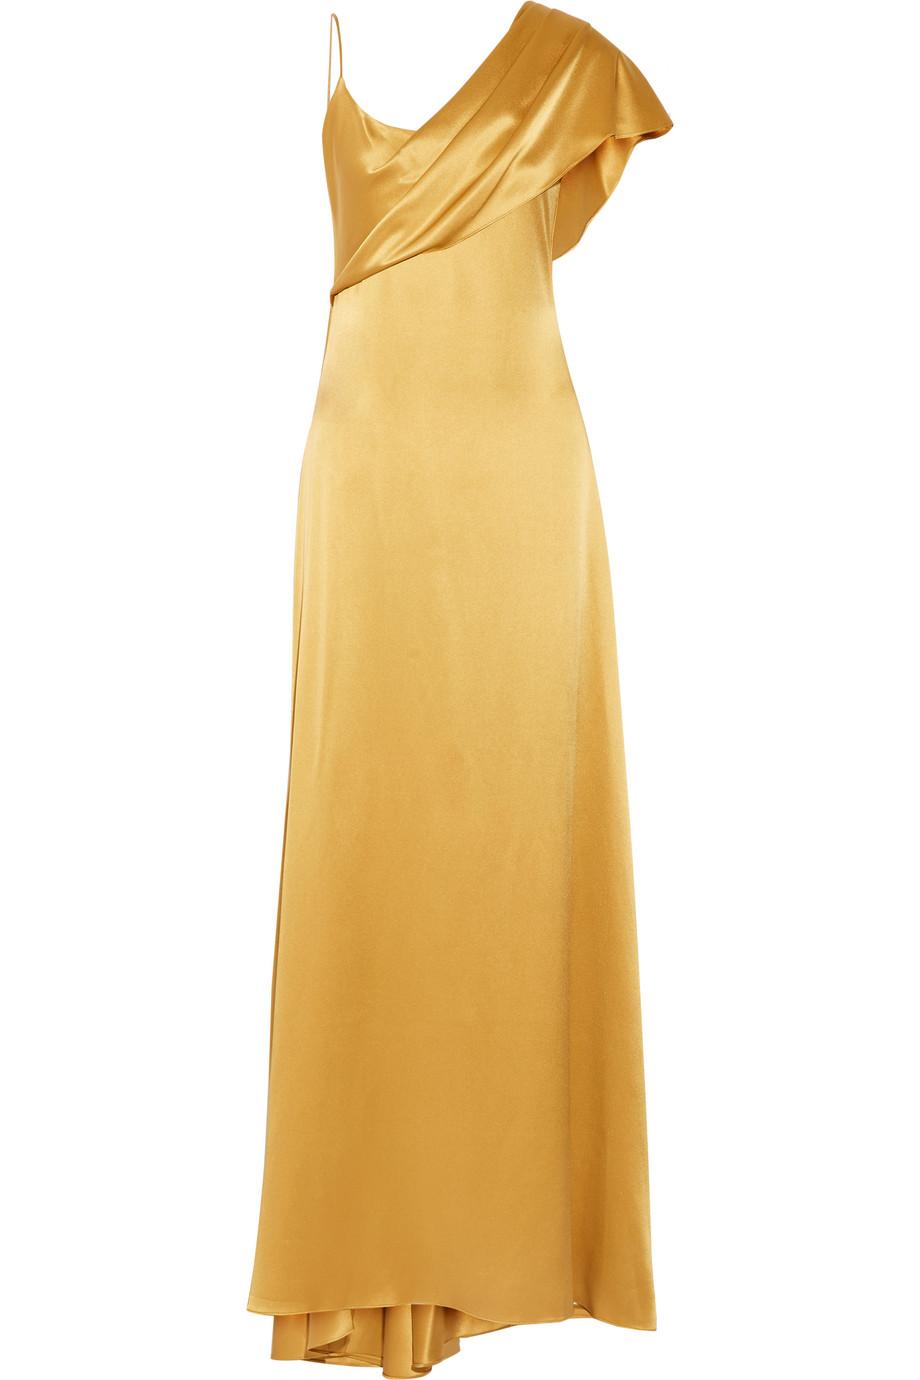 Cushnie Et Ochs Zahara Draped Silk-Charmeuse Gown, Gold, Women's, Size: 2